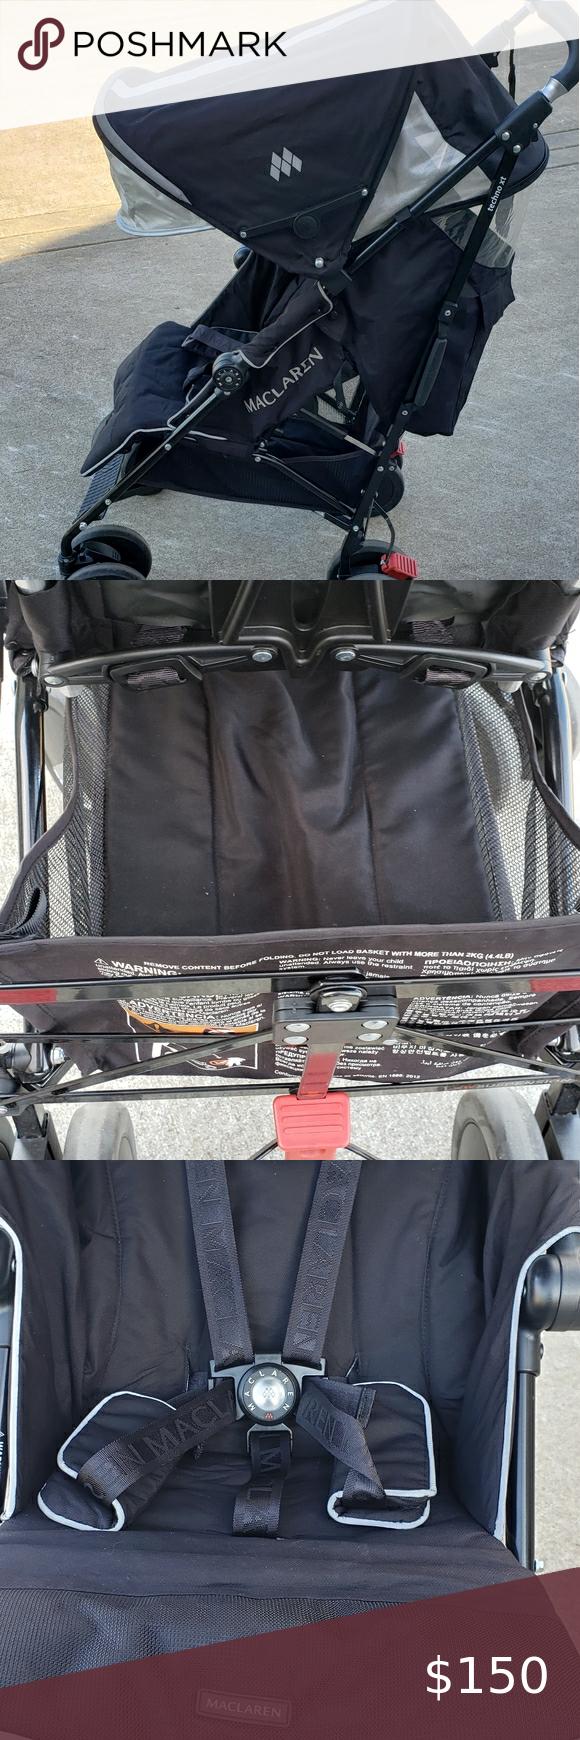 EUC Maclaren Techno XT stroller! in 2020 Stroller